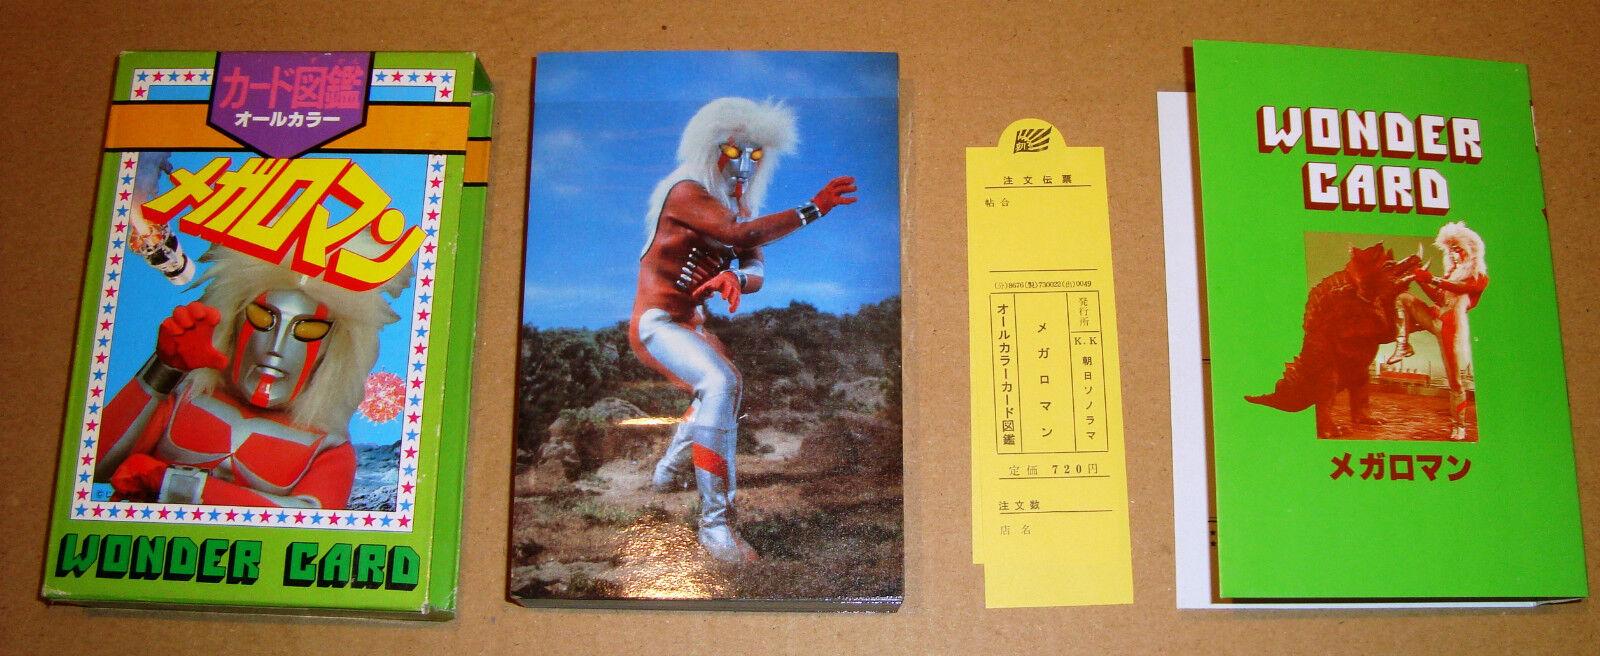 MEGALOMAN WONDER CARD BOOK SET COMPLETO 64 MEGACARD CON BOX ASAHI SONORAMA 1979